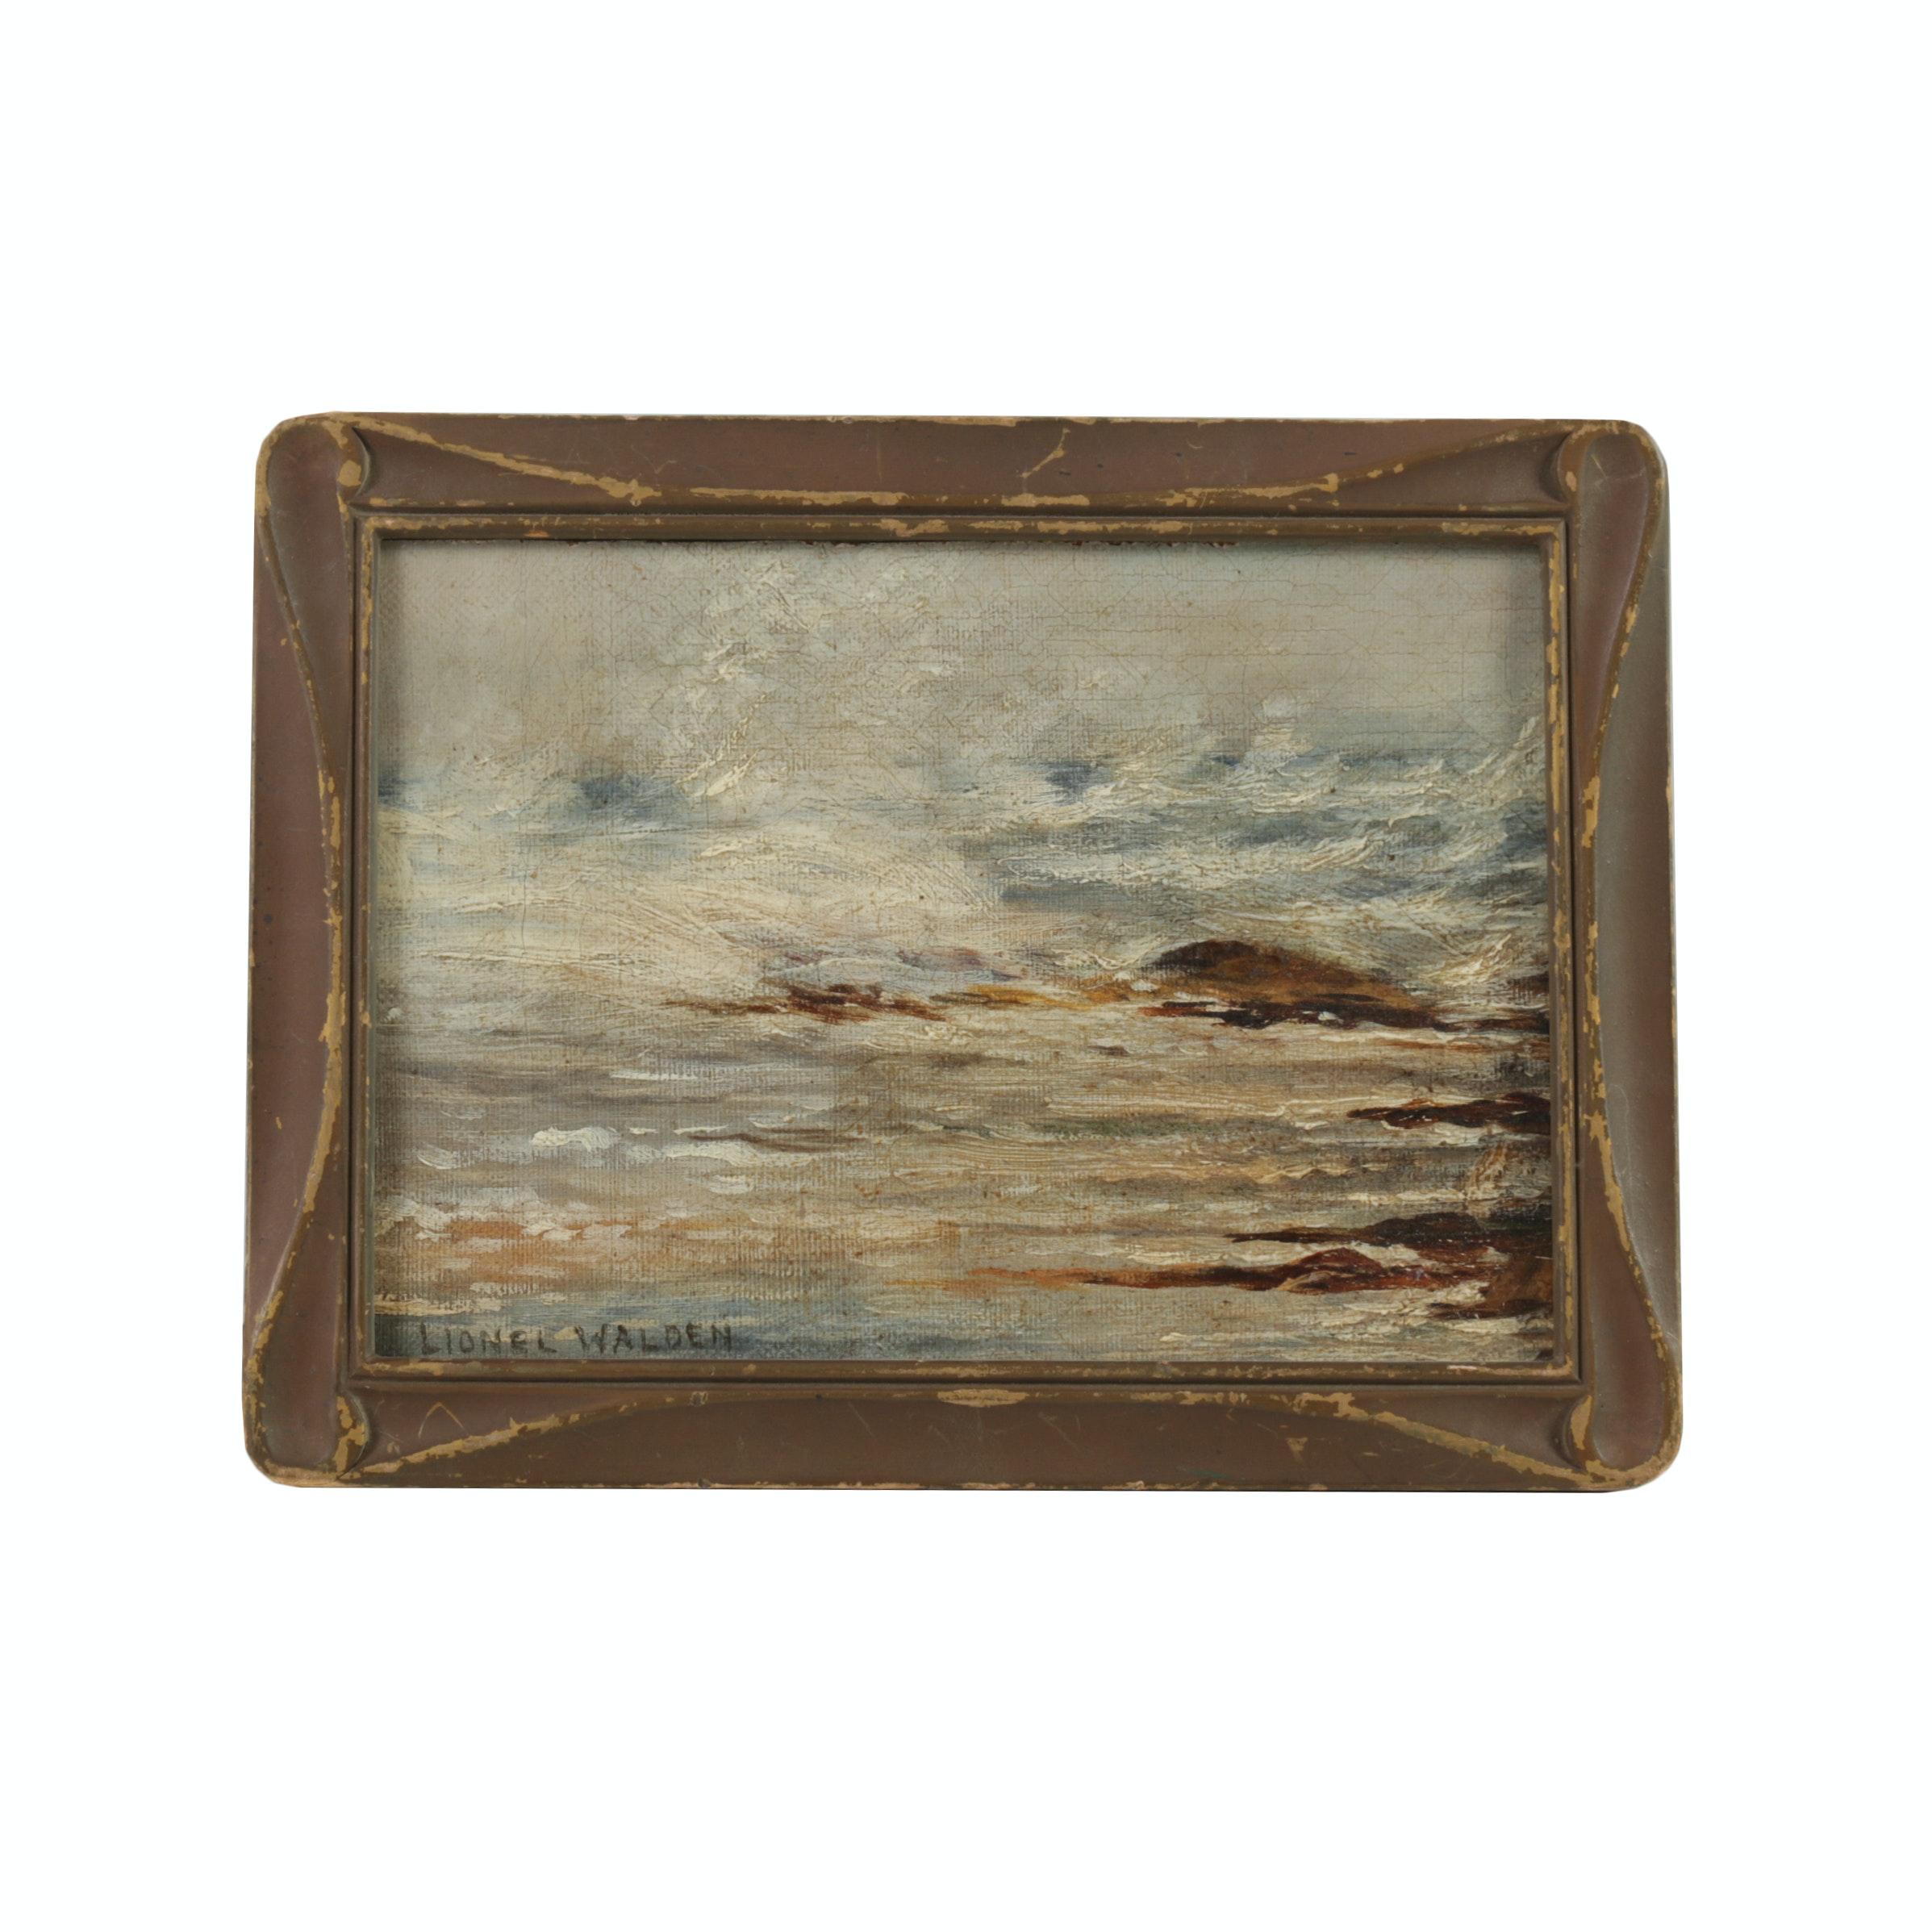 Lionel Walden Oil on Canvas Board Seascape